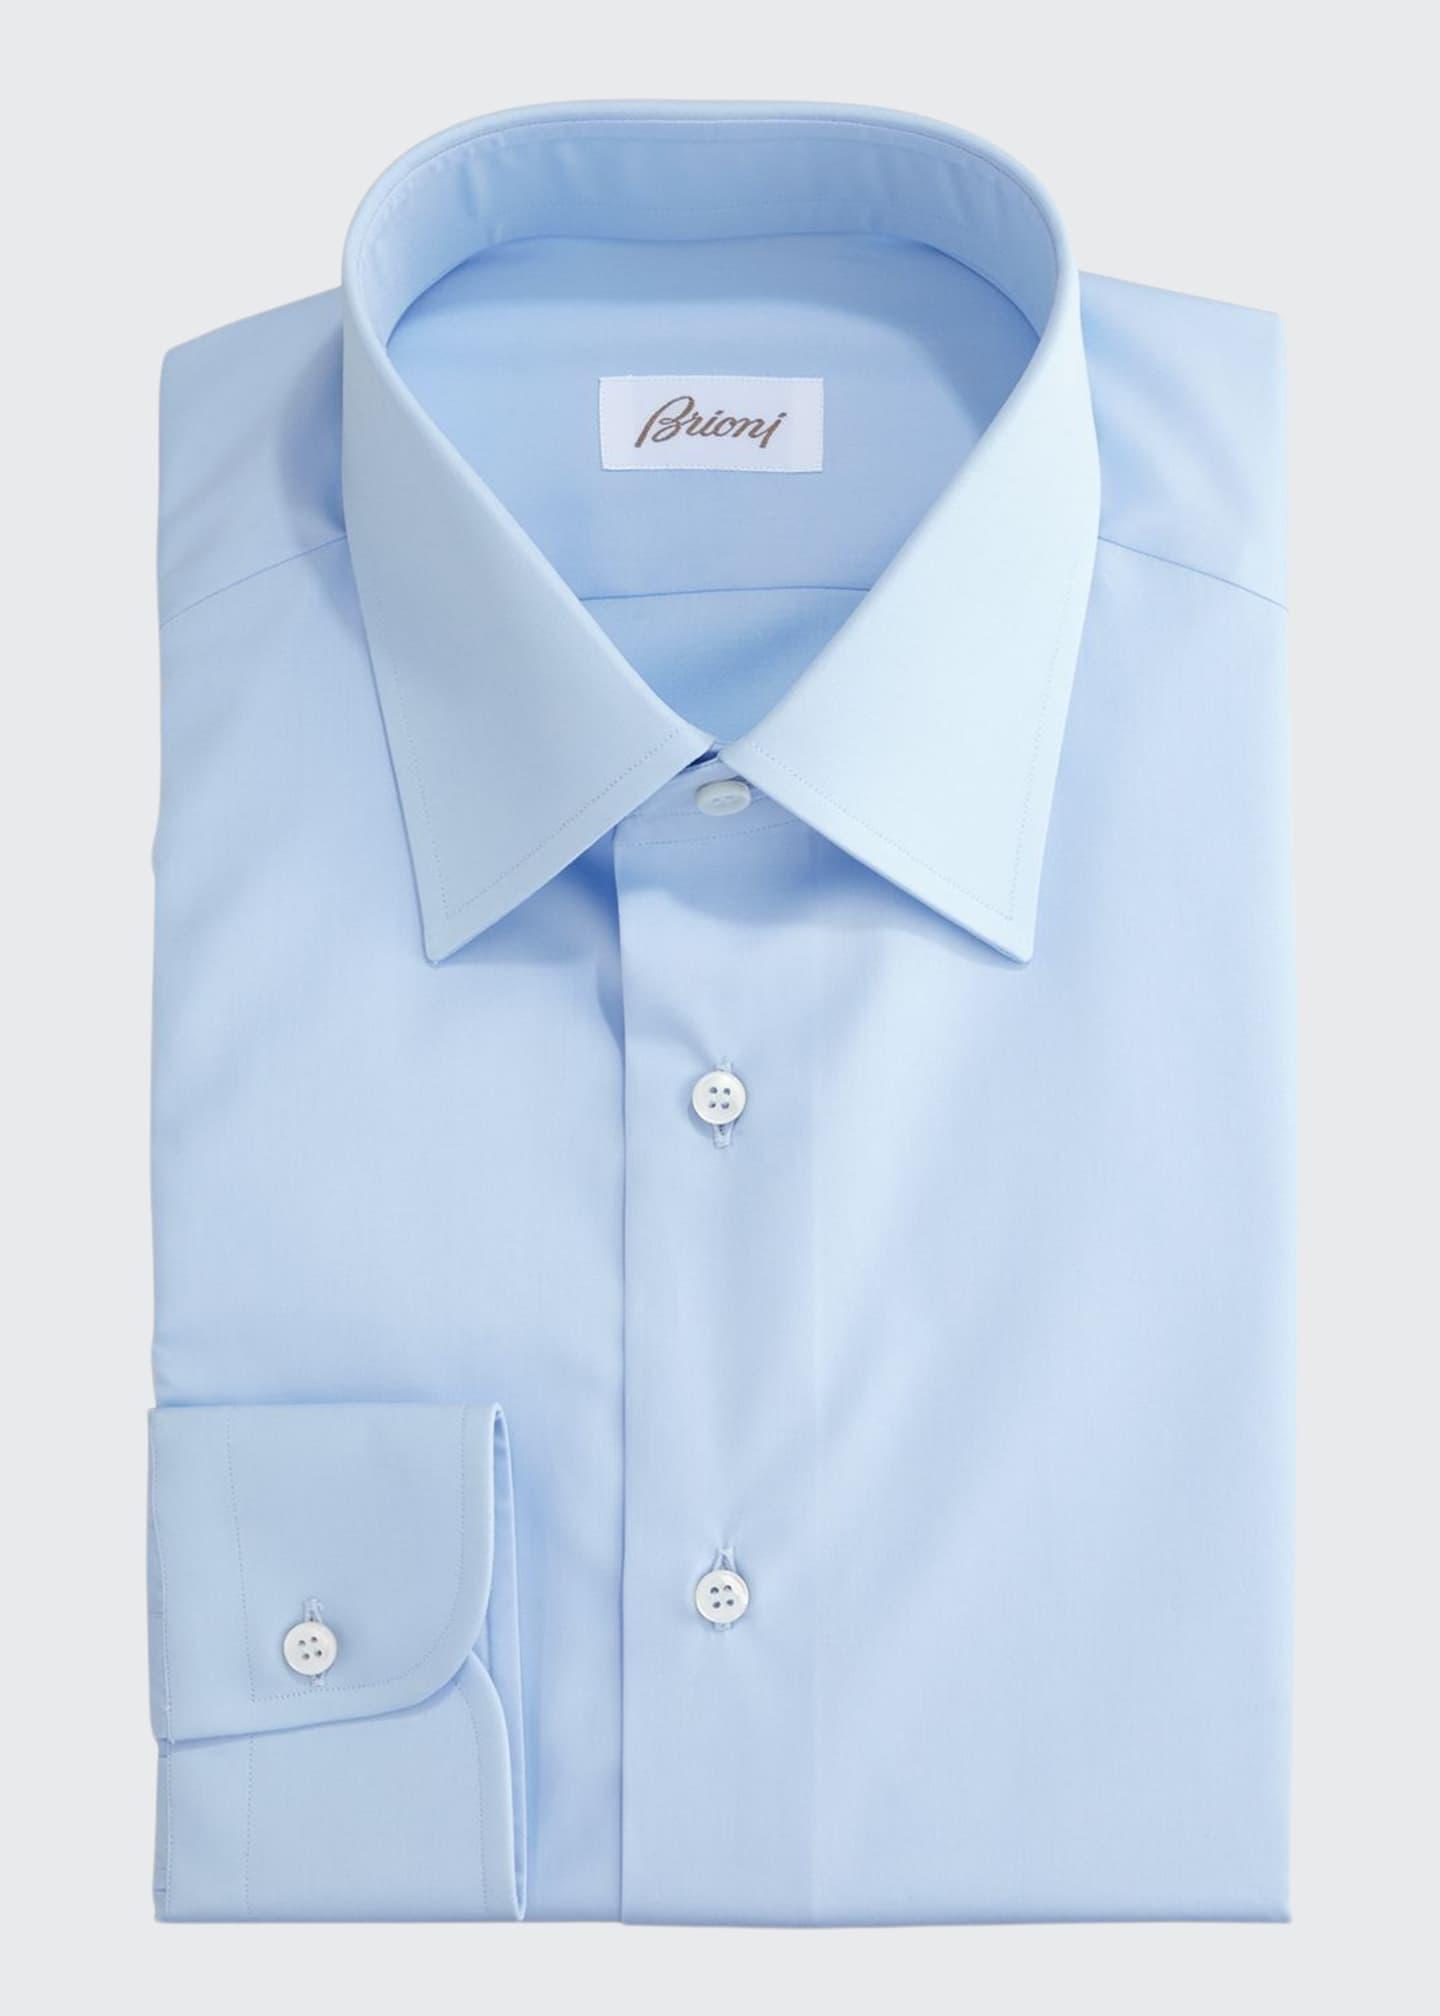 Brioni Wardrobe Essential Solid Dress Shirt, Blue